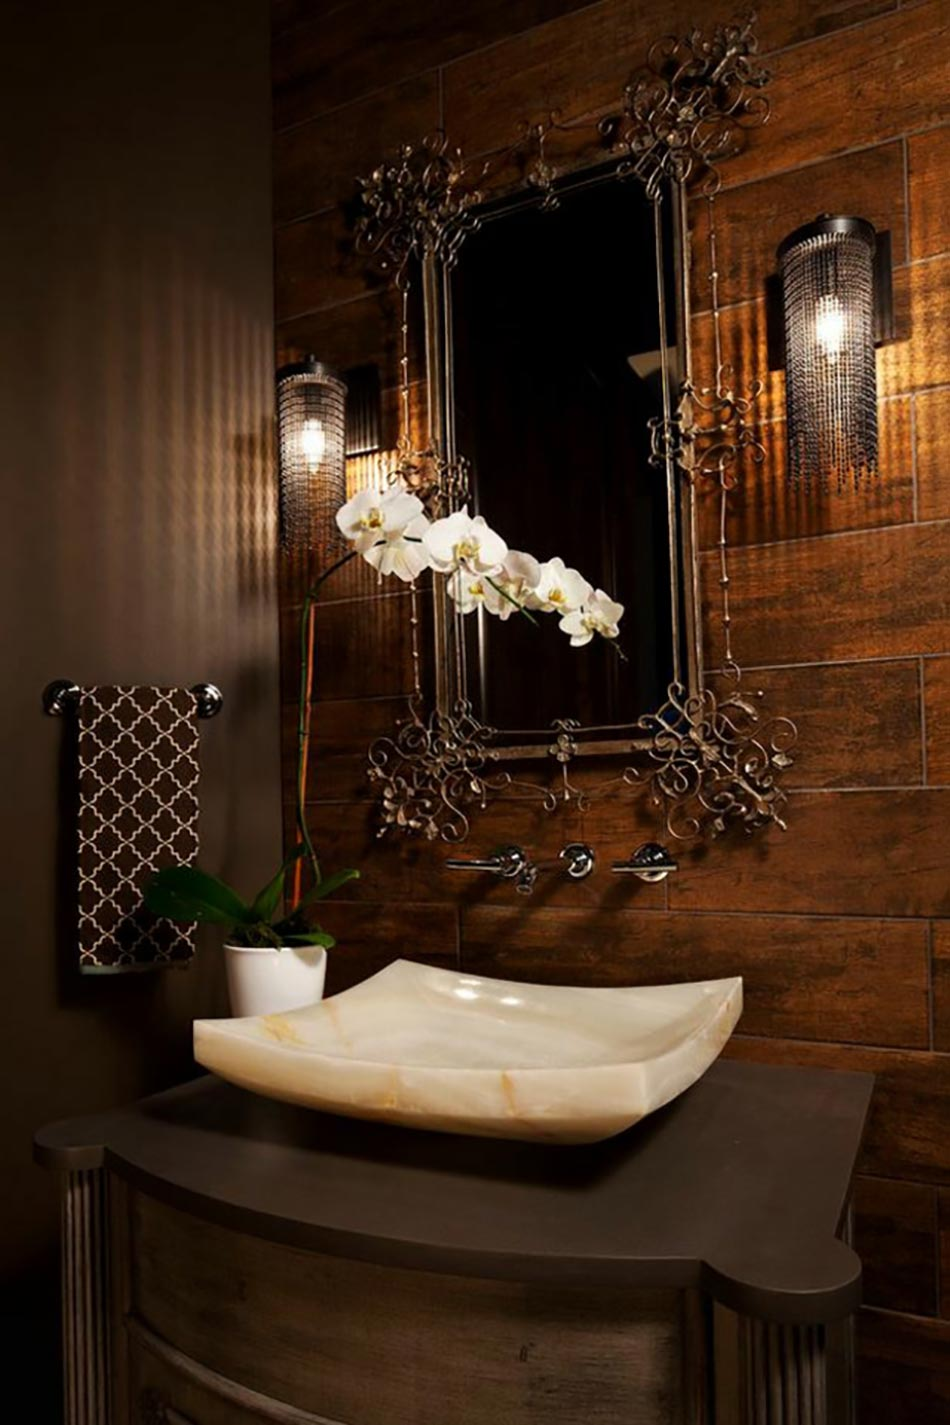 Plante Pour Salle De Bain Sombre des teintes sombres pour une salle de bain moderne | design